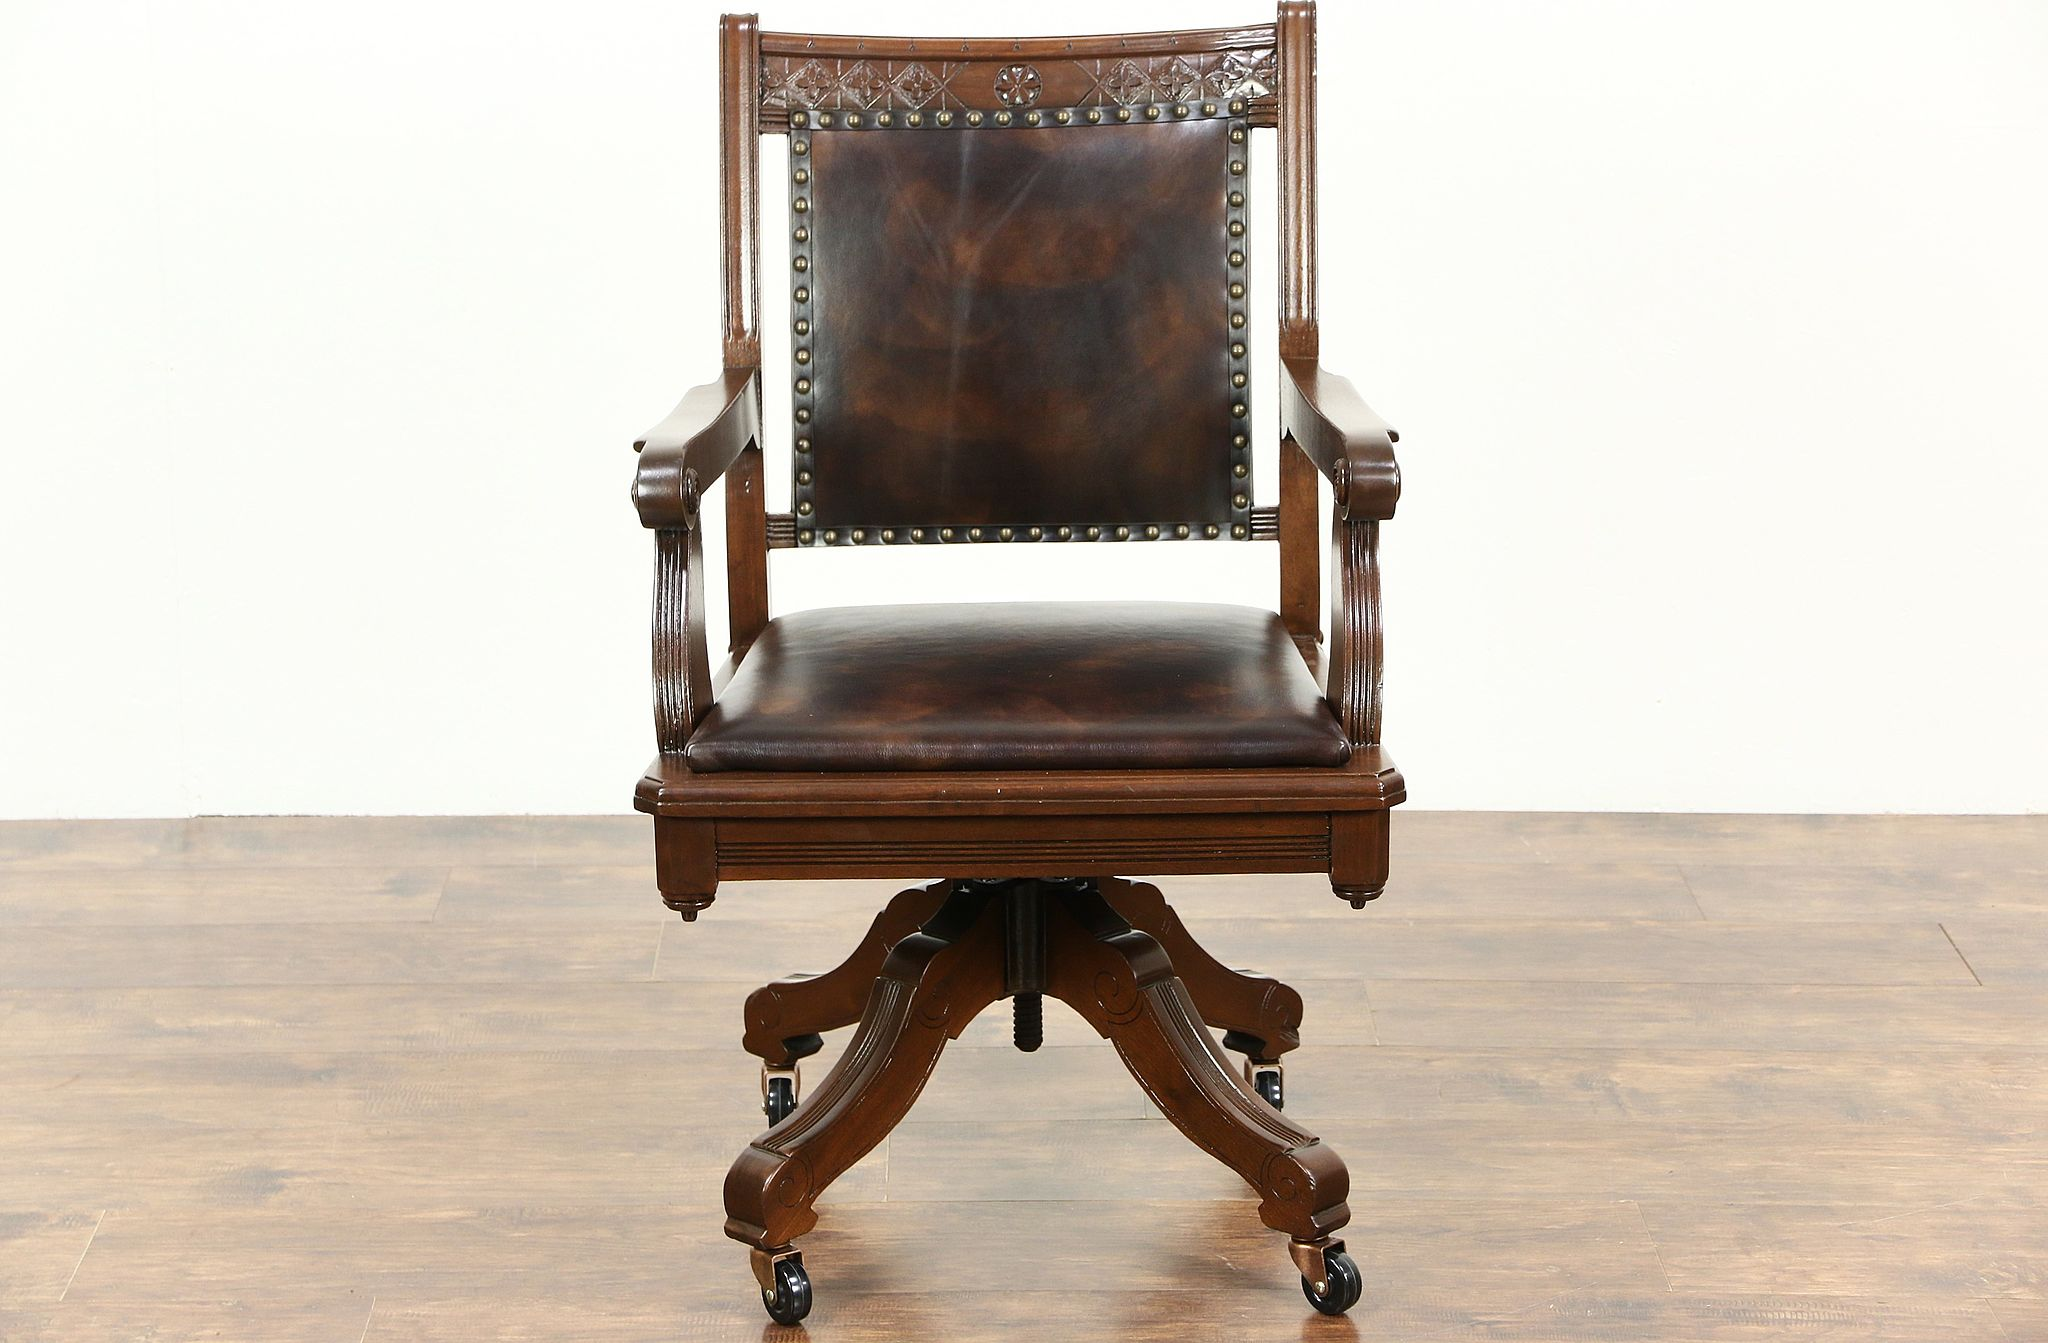 Etonnant Victorian Eastlake 1890 Antique Walnut Swivel Desk Chair, New Leather